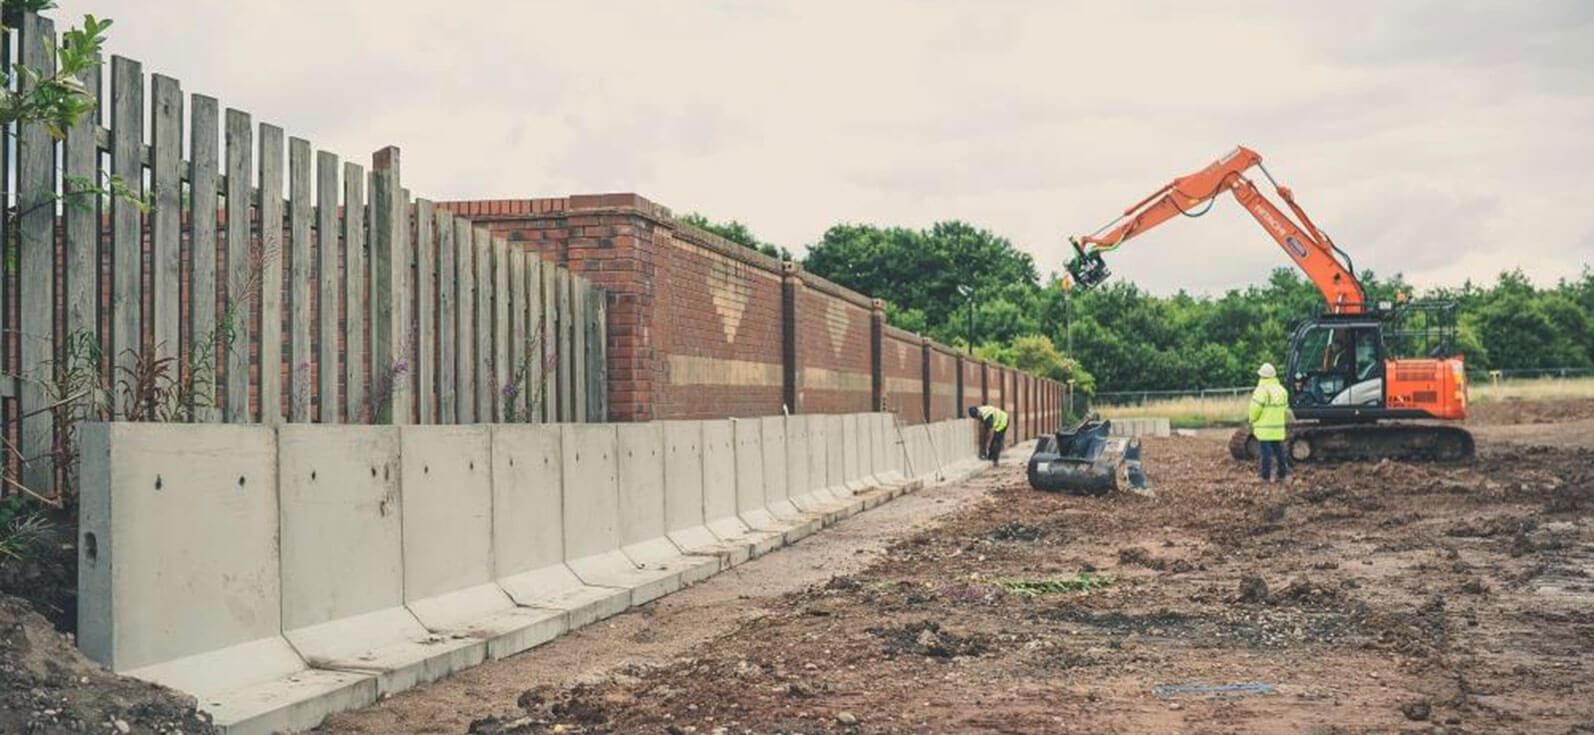 L-Shaped-Walls